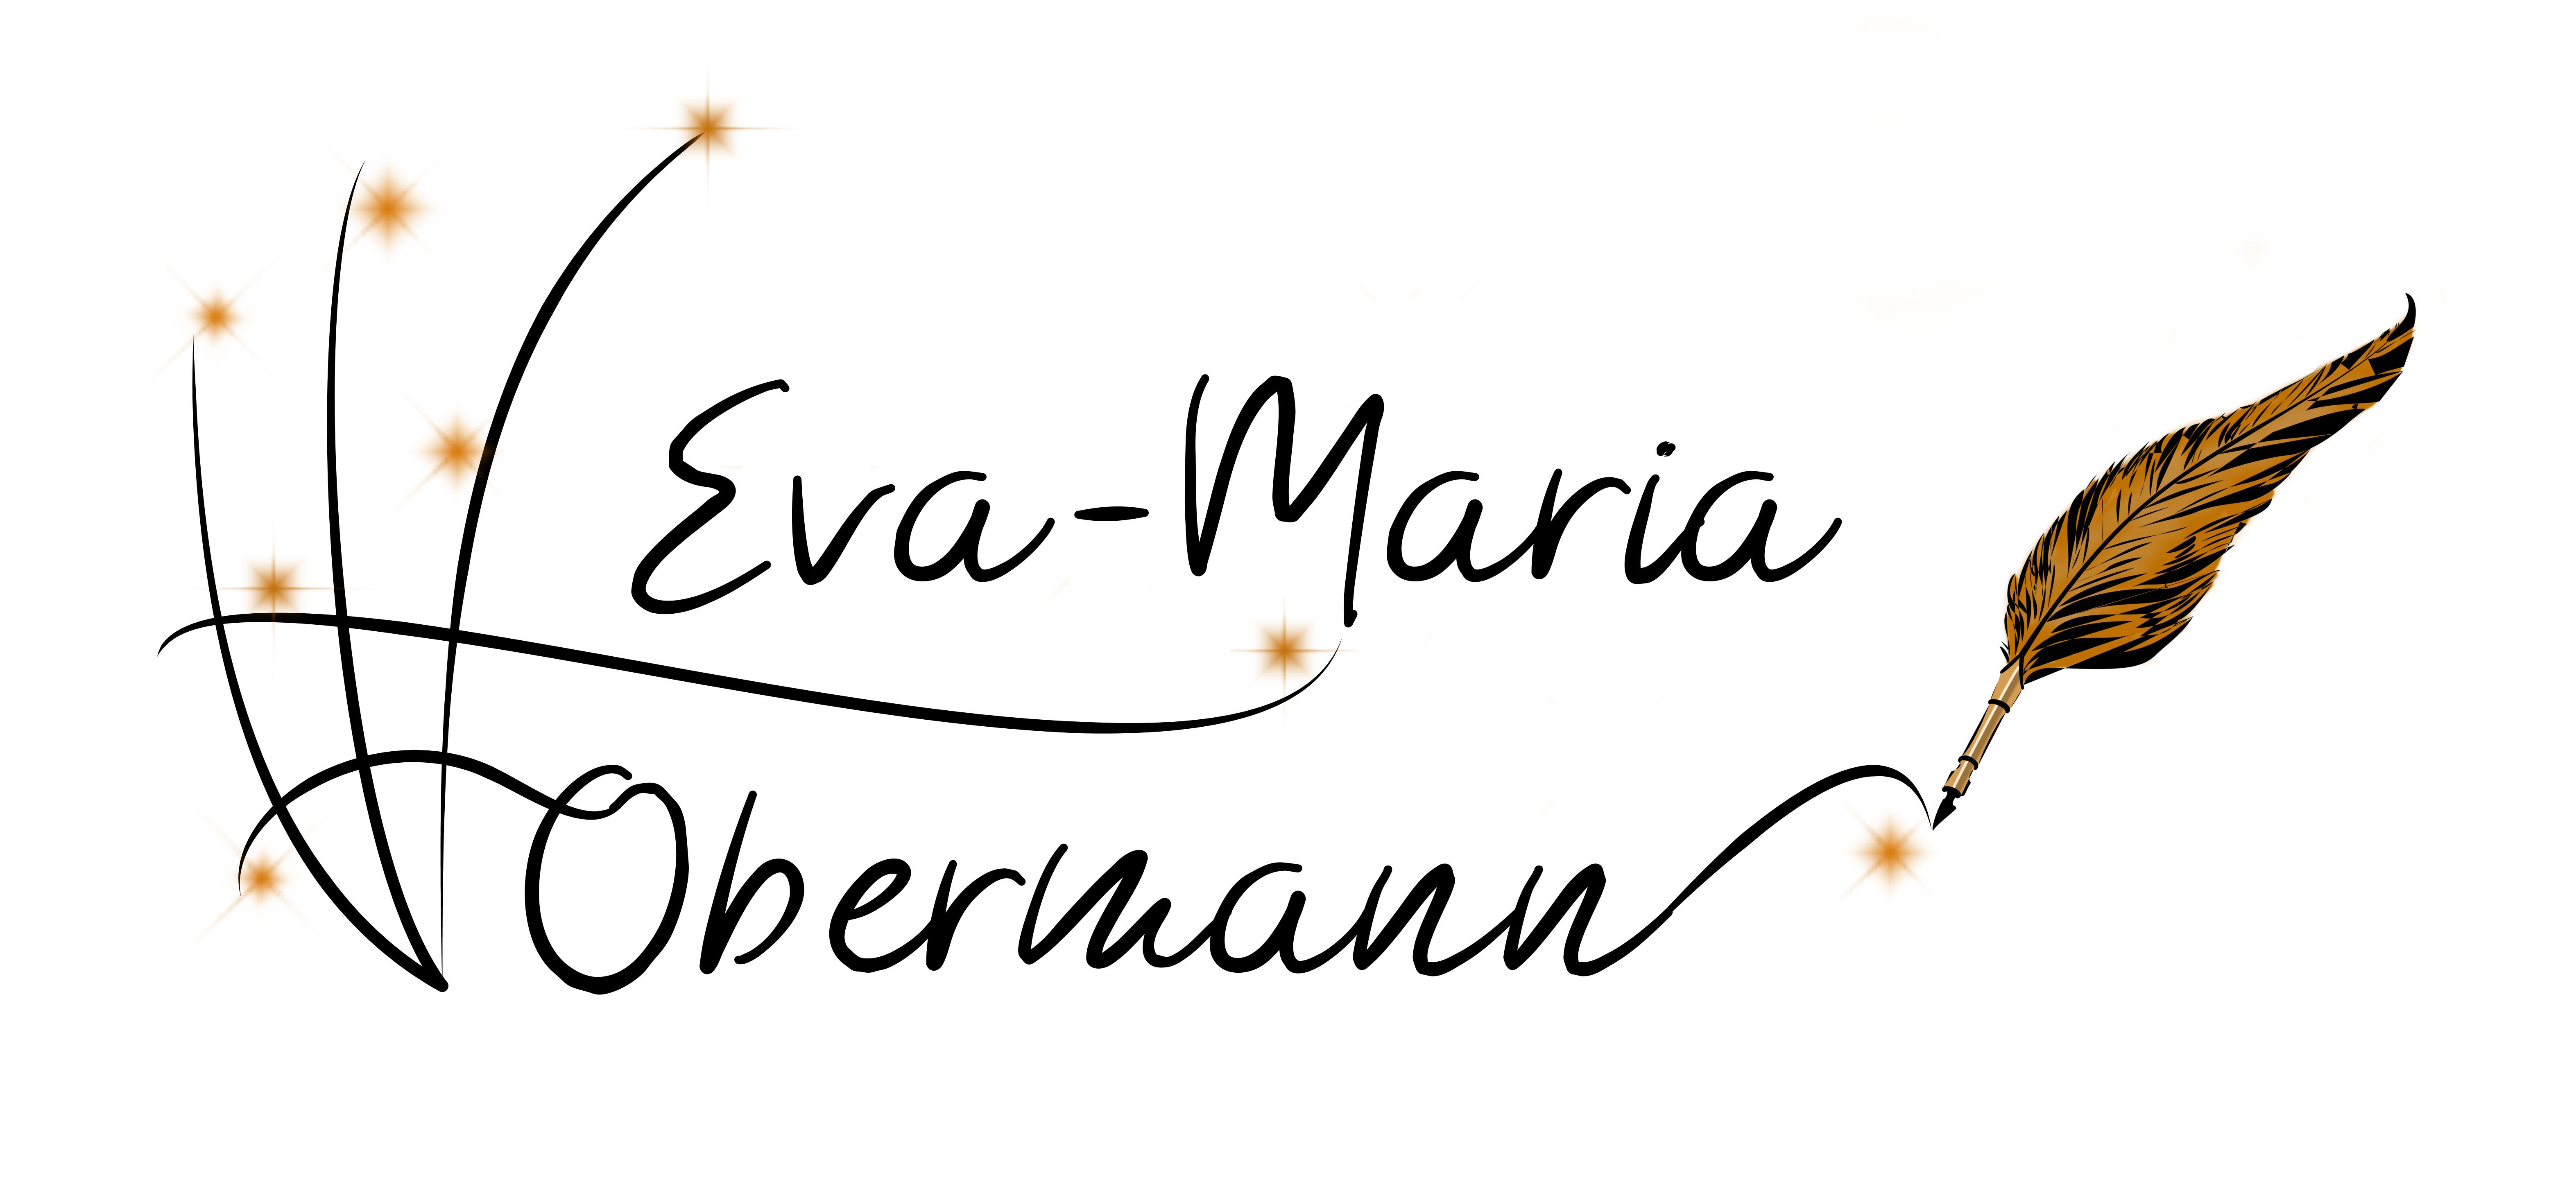 https://cdn.discordapp.com/attachments/626683184838606848/627550015216418816/Eva-Maria_Obermann.jpg